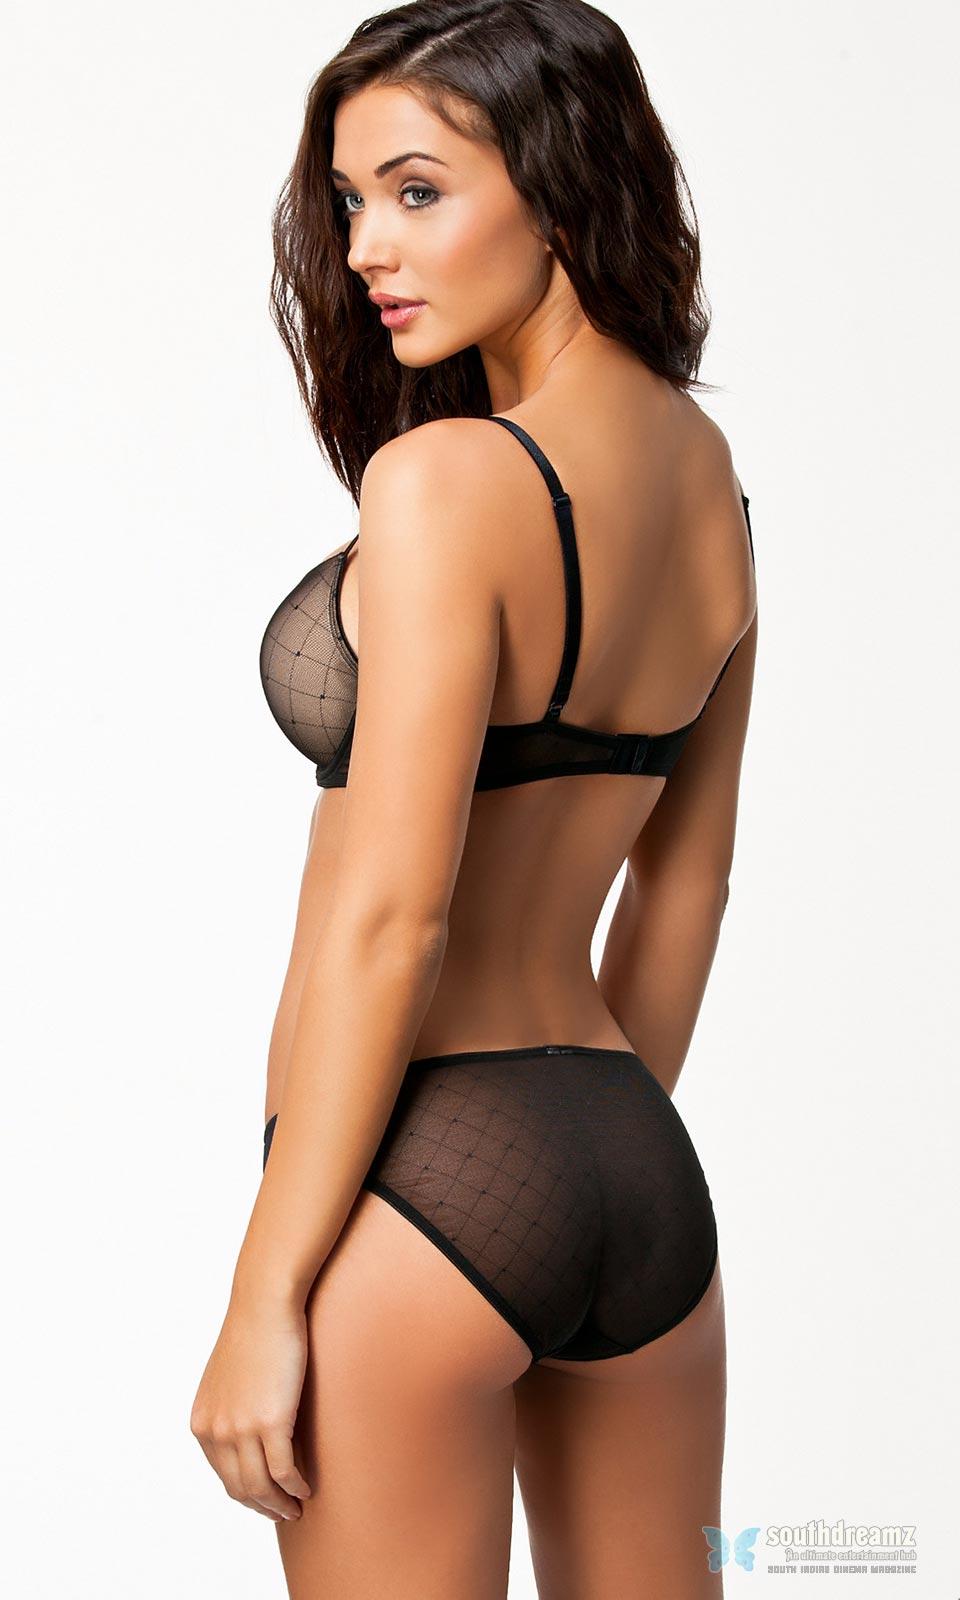 Amy Jackson Leaked Pics amy jackson hot and sexy photos in bikini ~ fun triangle